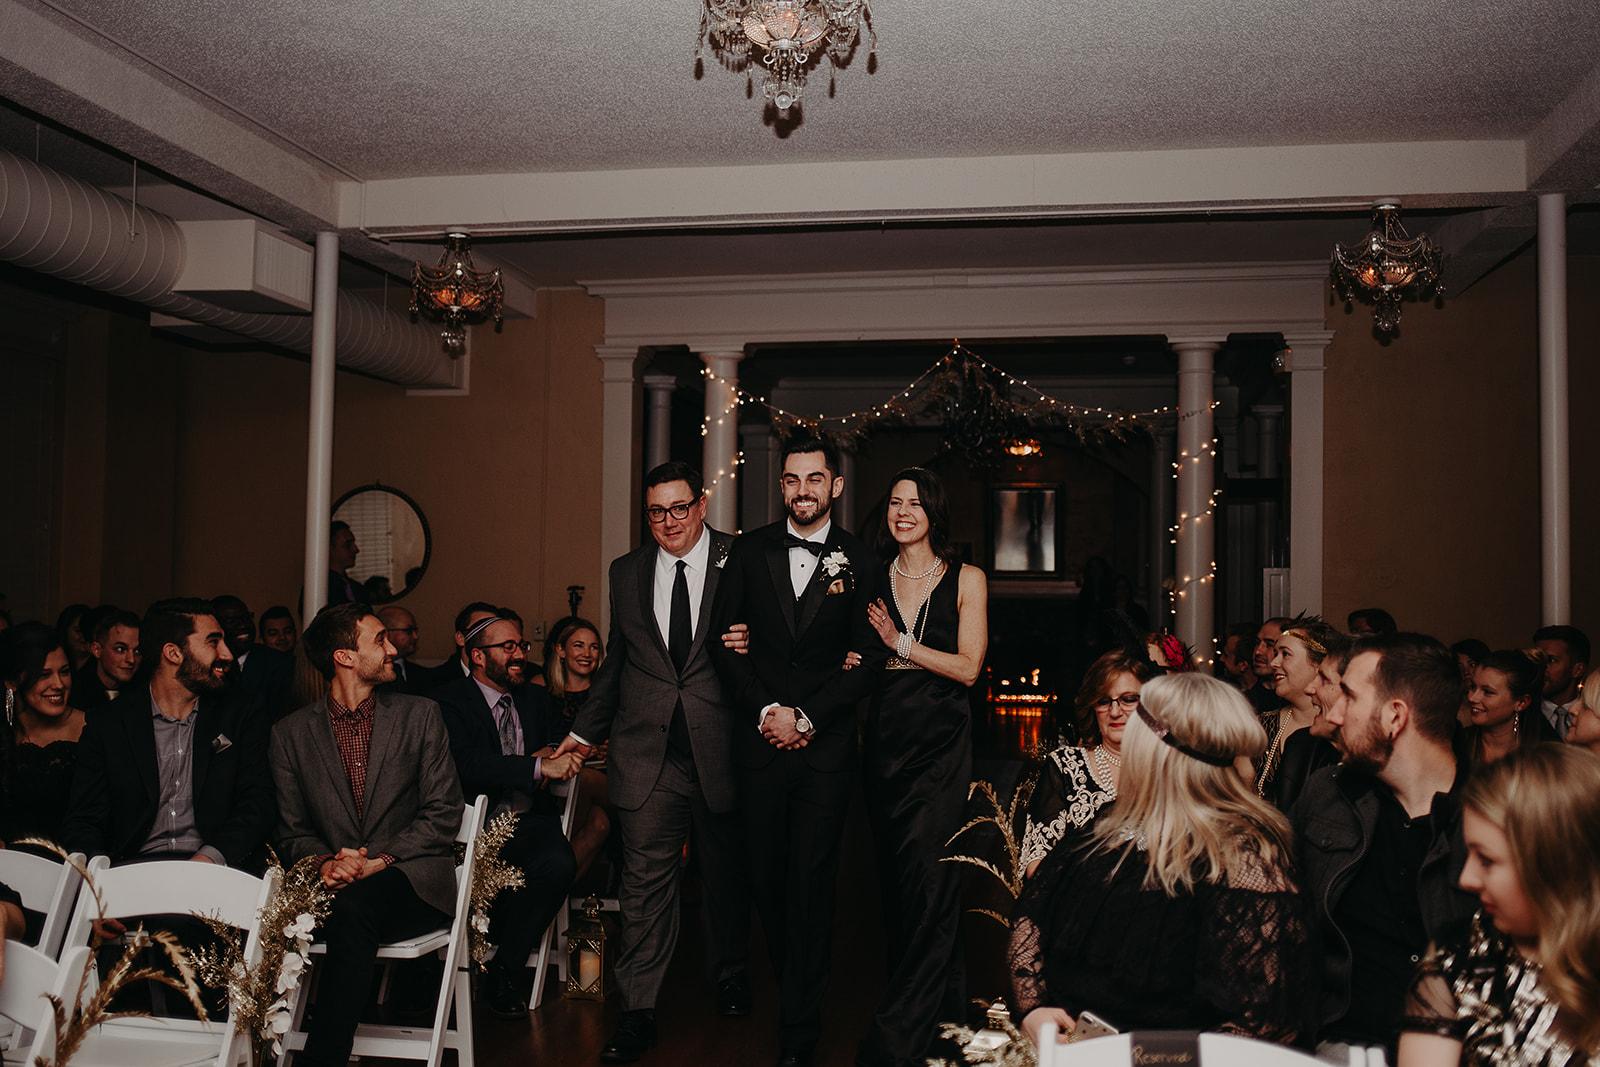 levi-natalie-wedding-bellingham-broadway-hall-reception (1 of 5).jpg